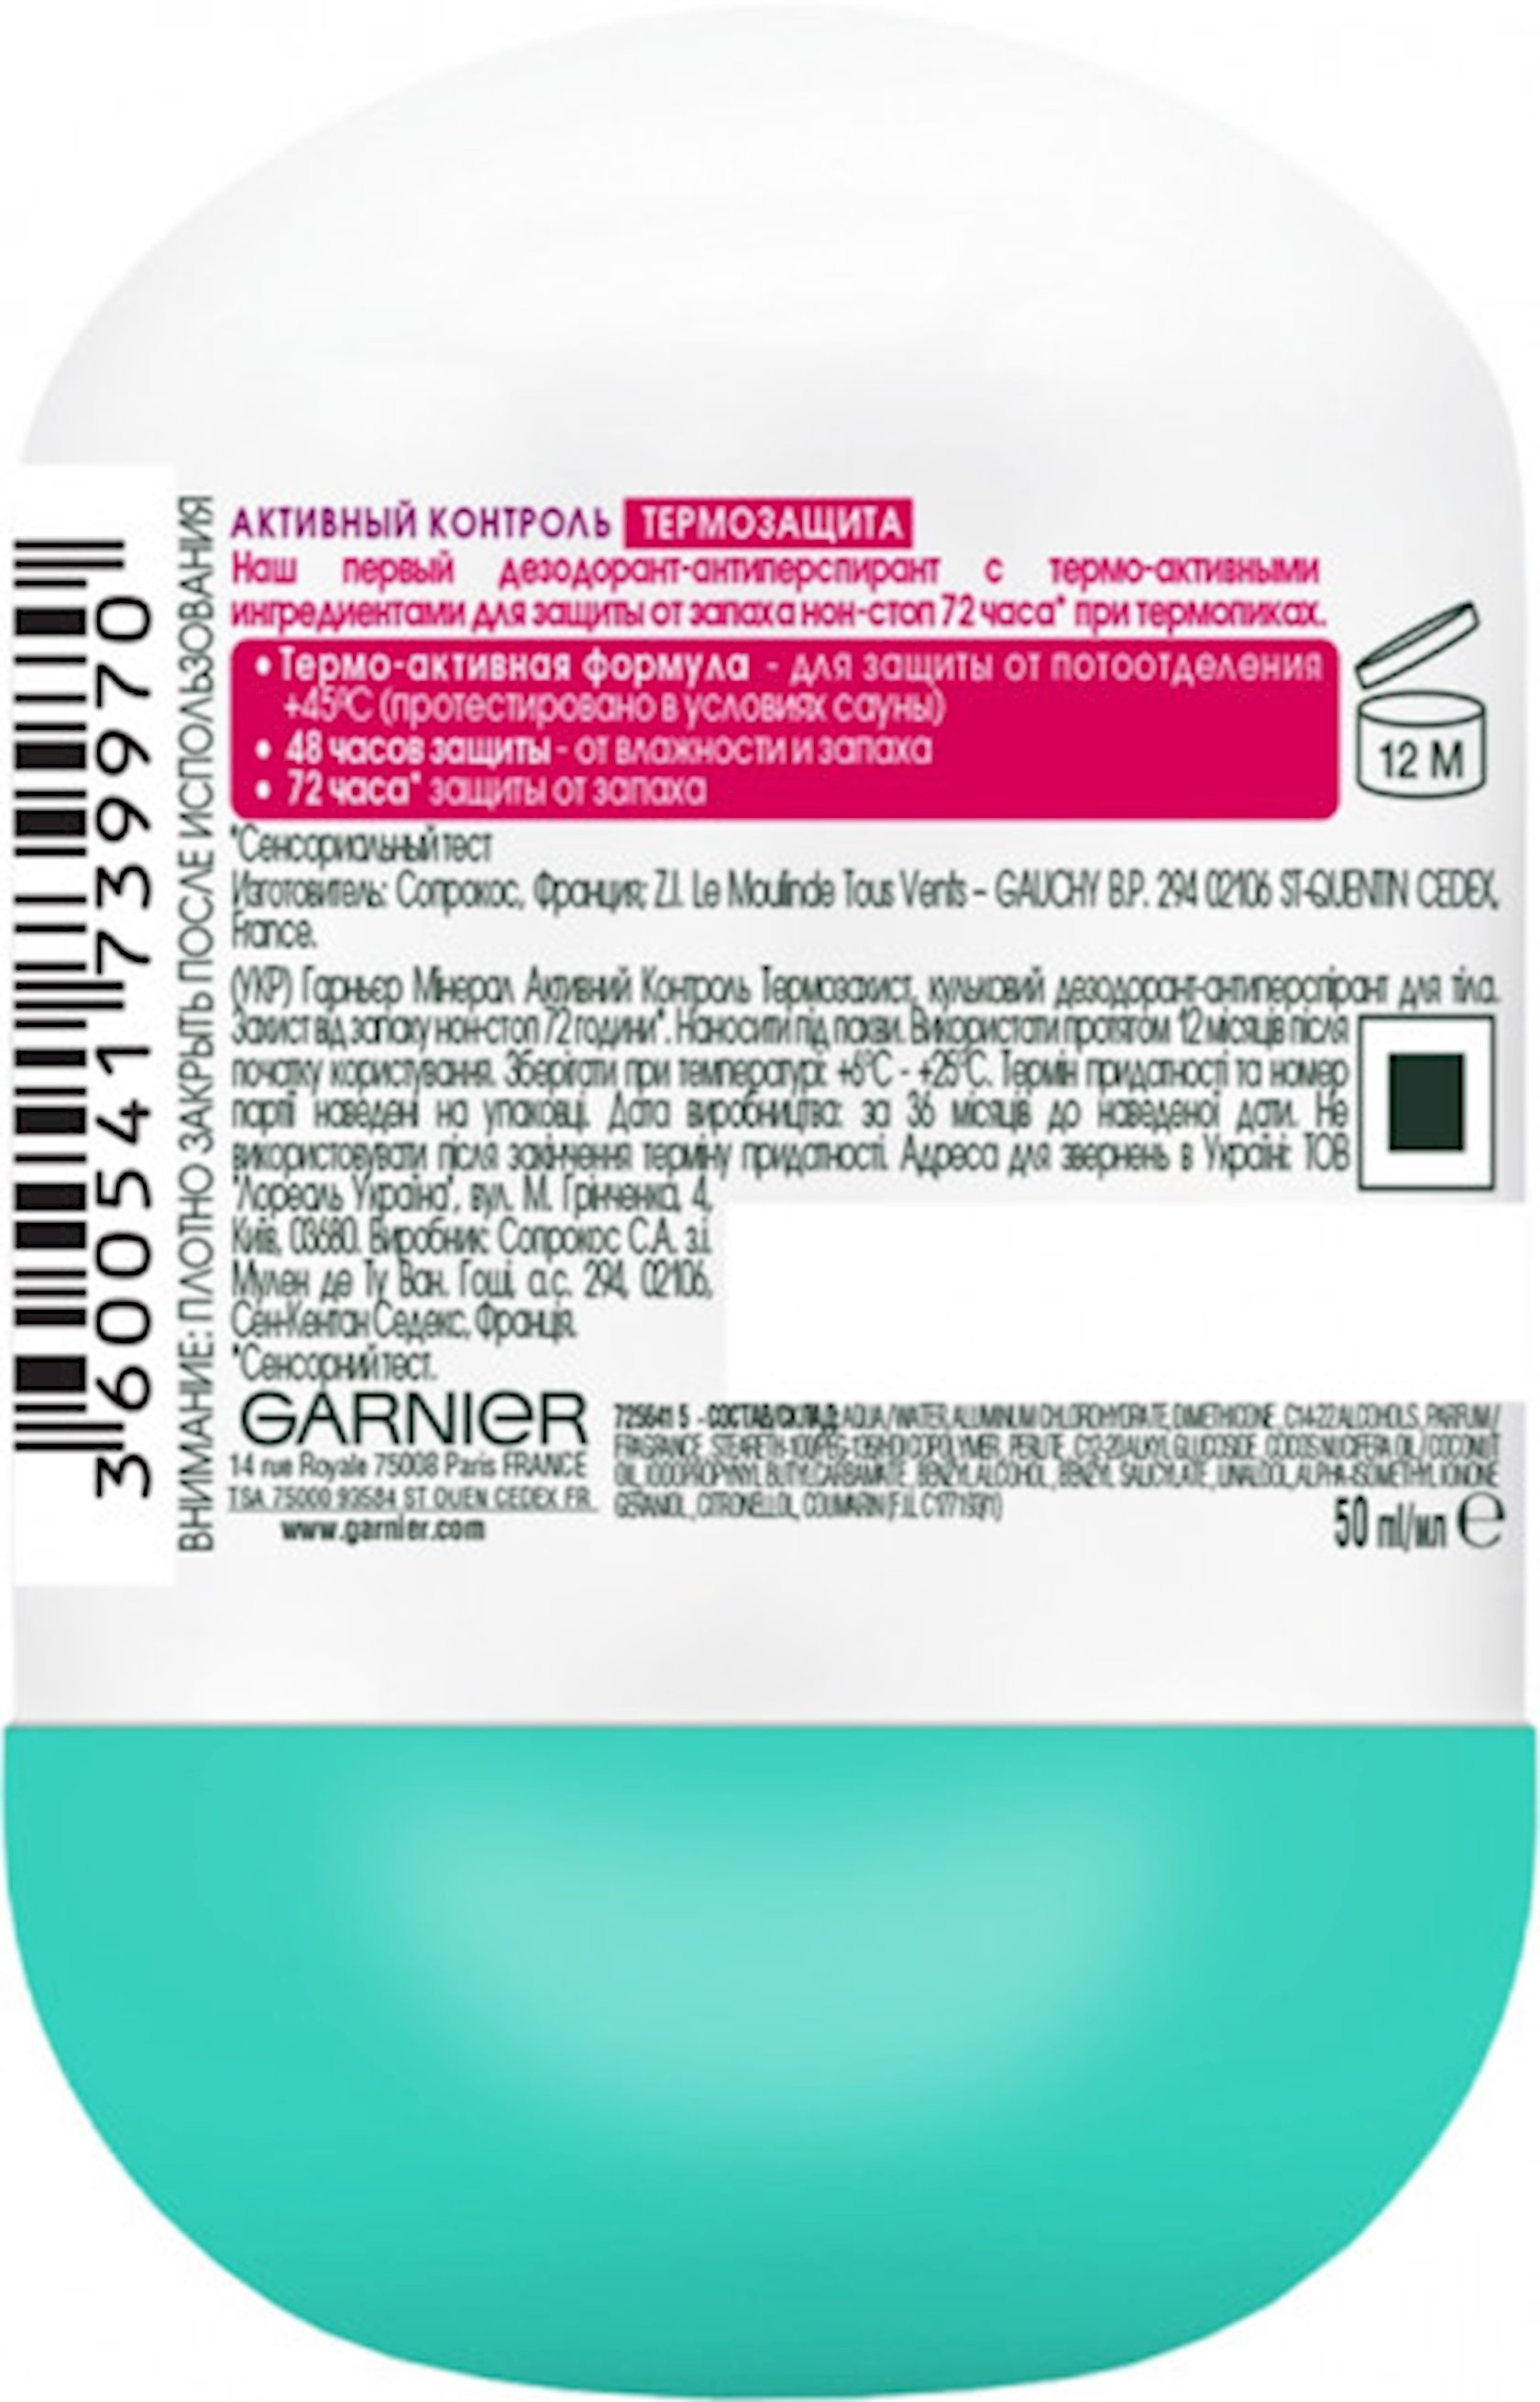 Antiperspirant Garnier Mineral aktiv kontrol Termik müdafiə, diyircəkli